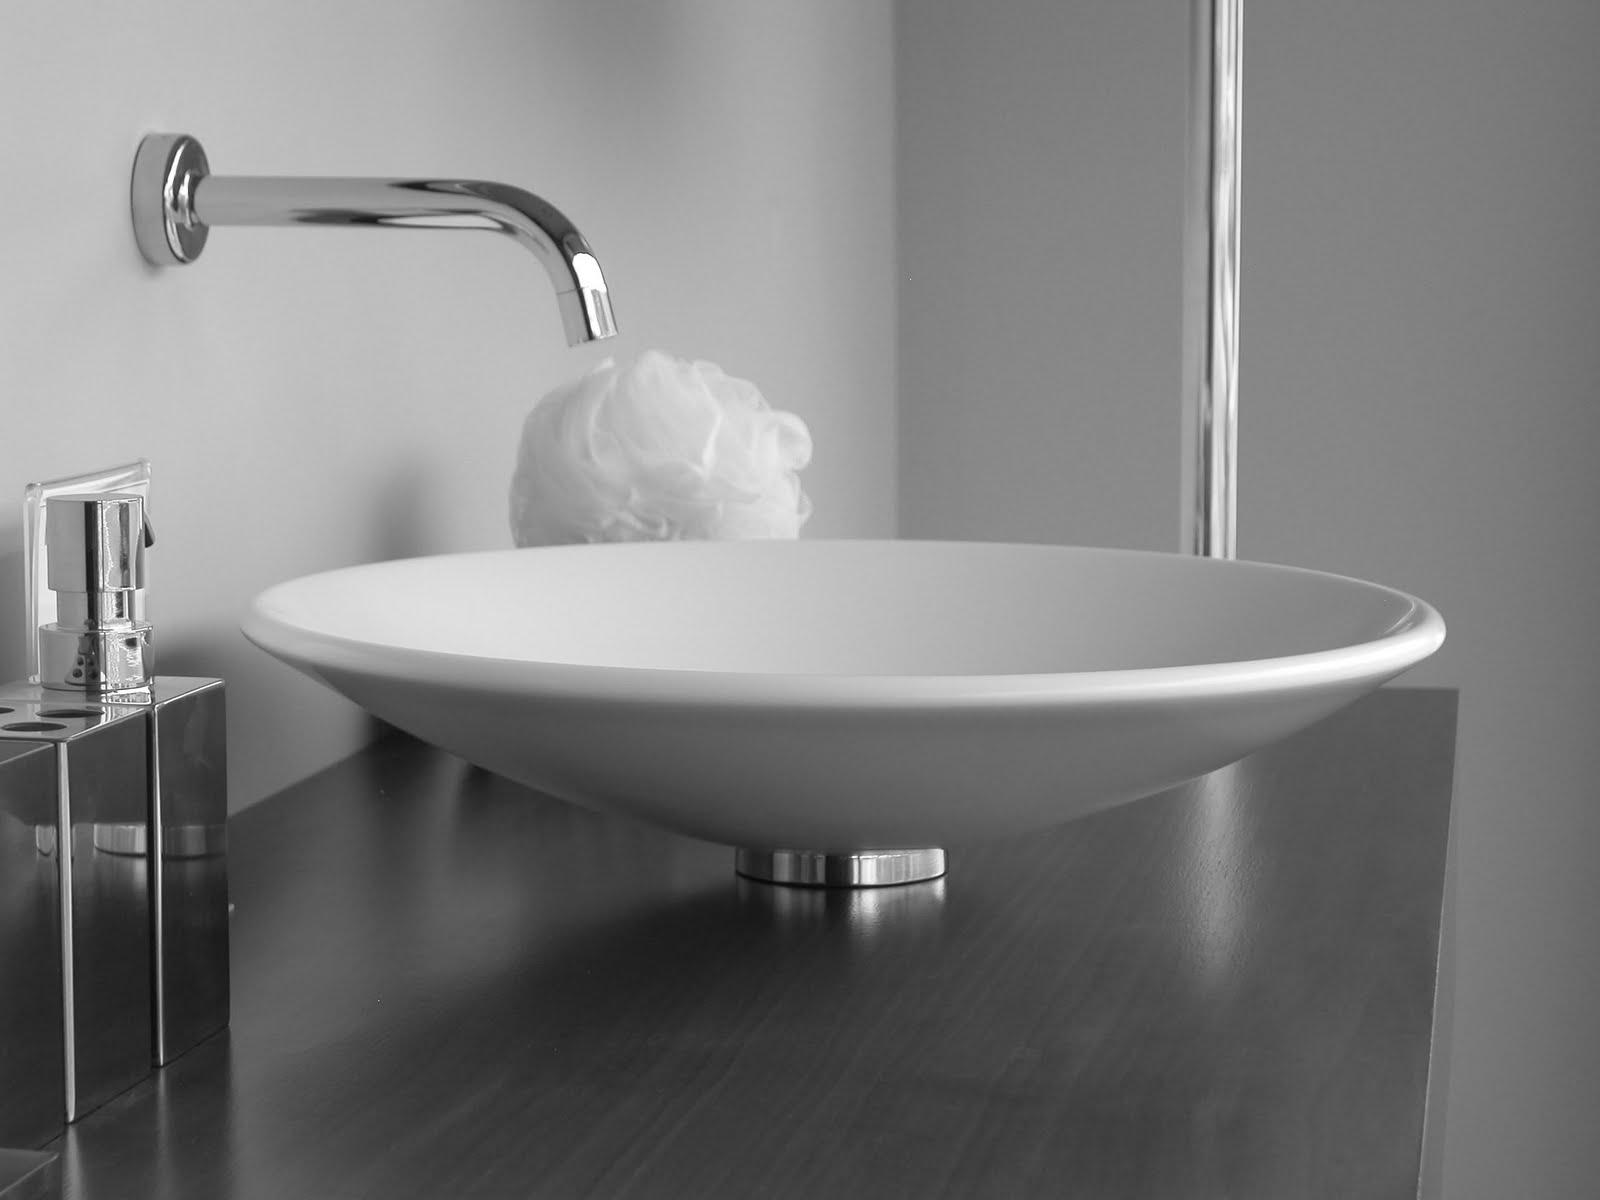 Minosa bathroom washbasins for Best wash basin design